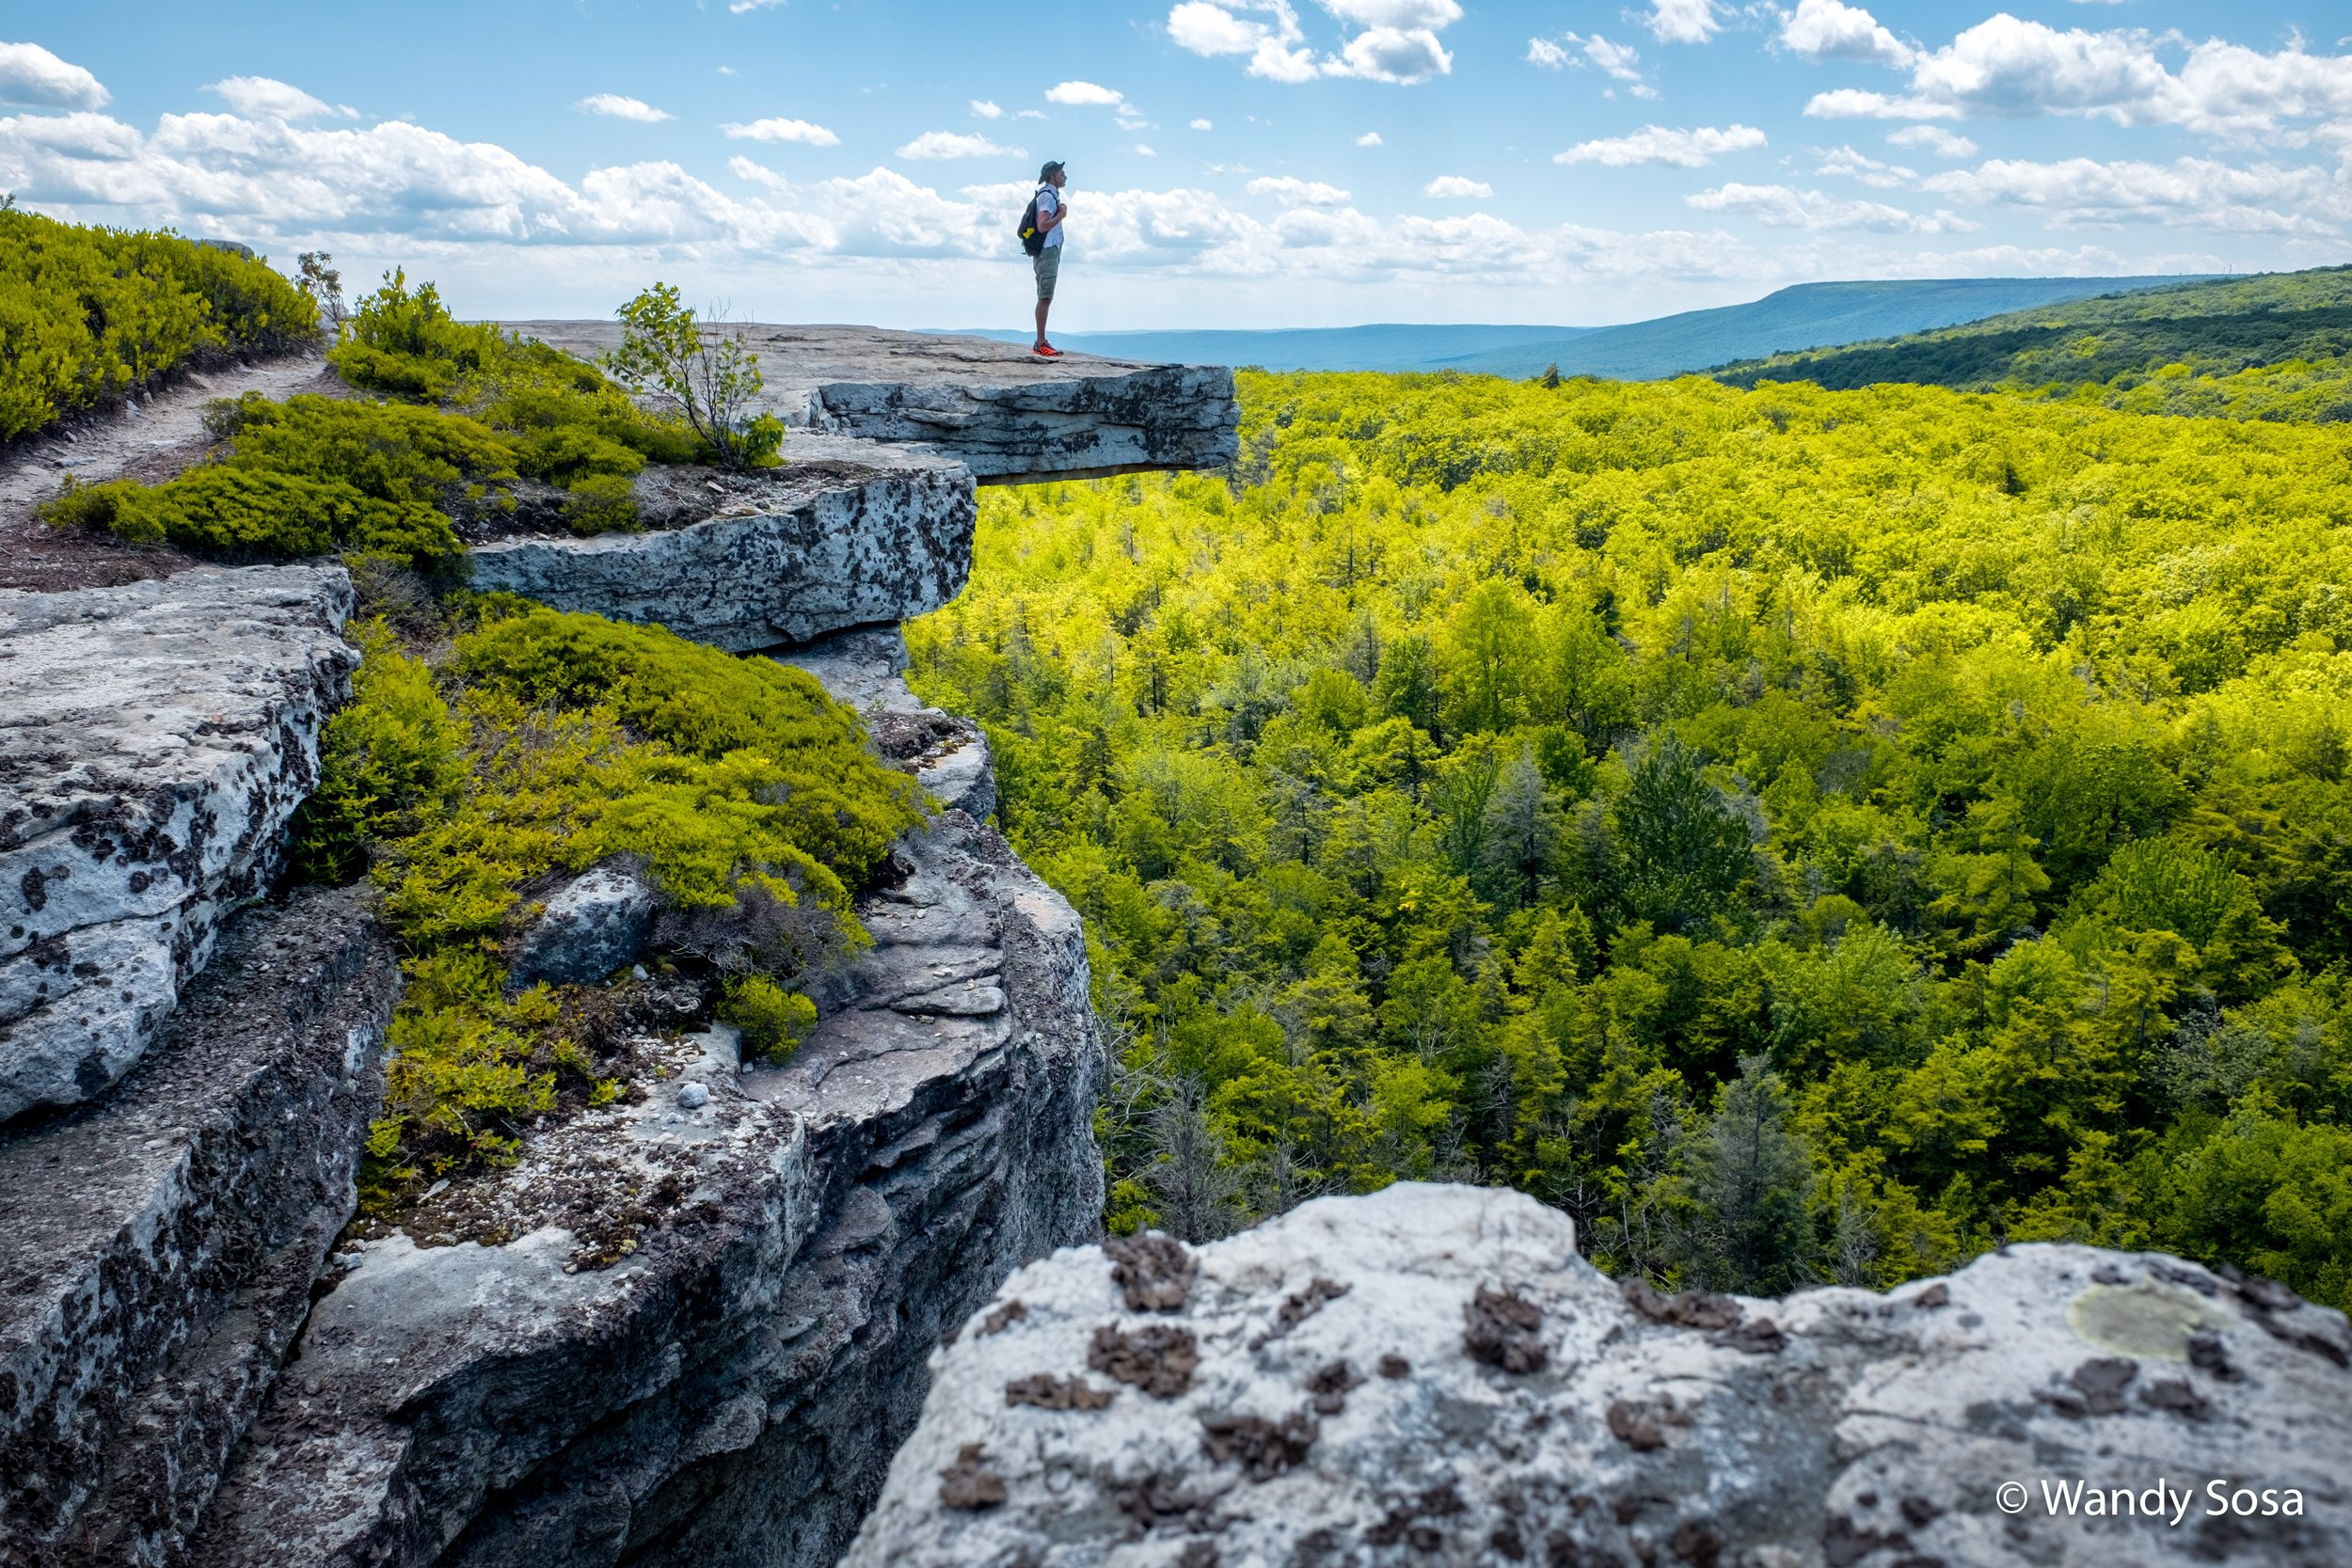 Minnewaska State Park Preserve, New York, USA (photo by Wandy)